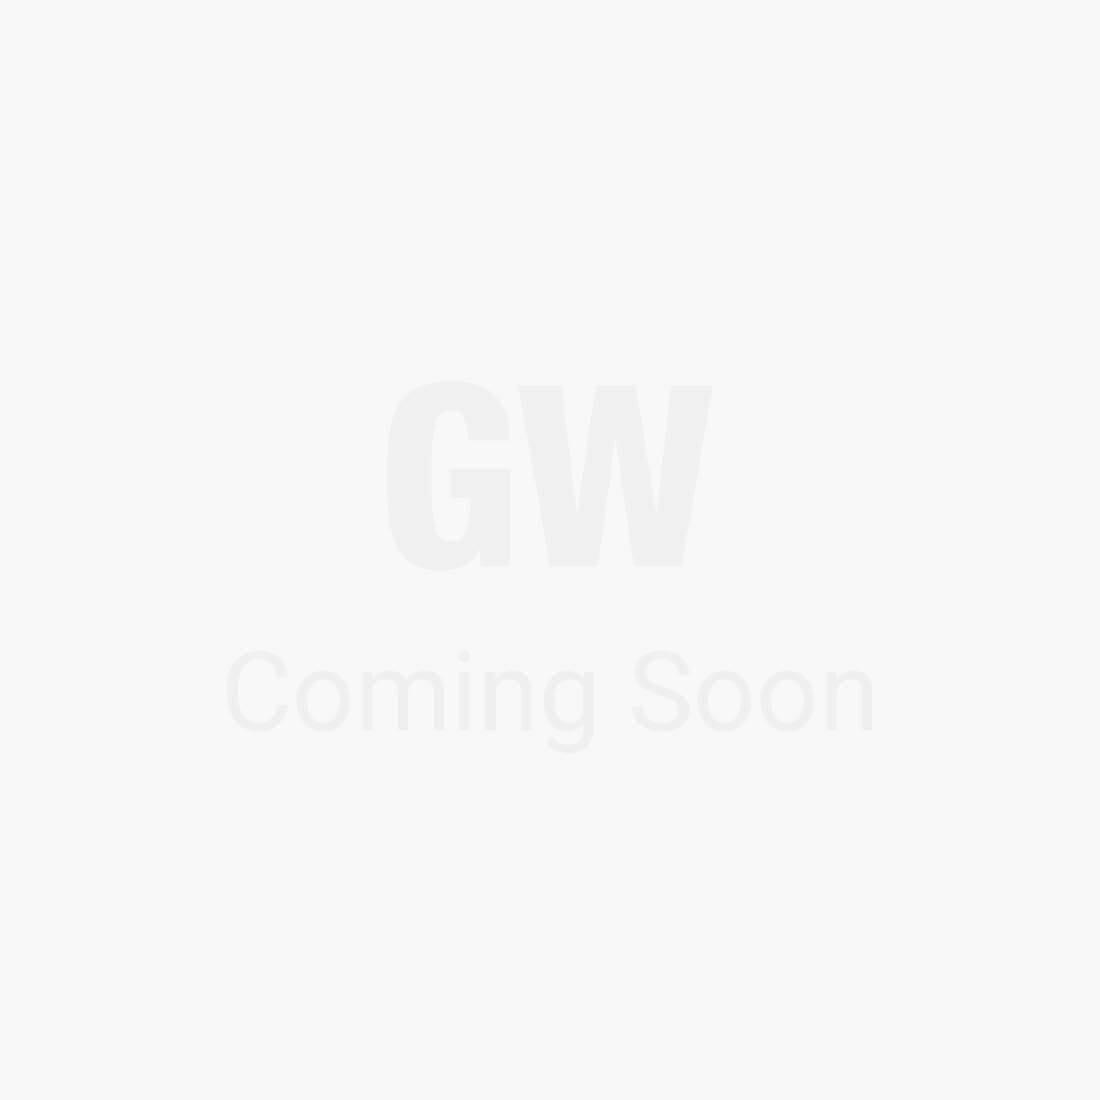 Plantation Diego Dining Chair